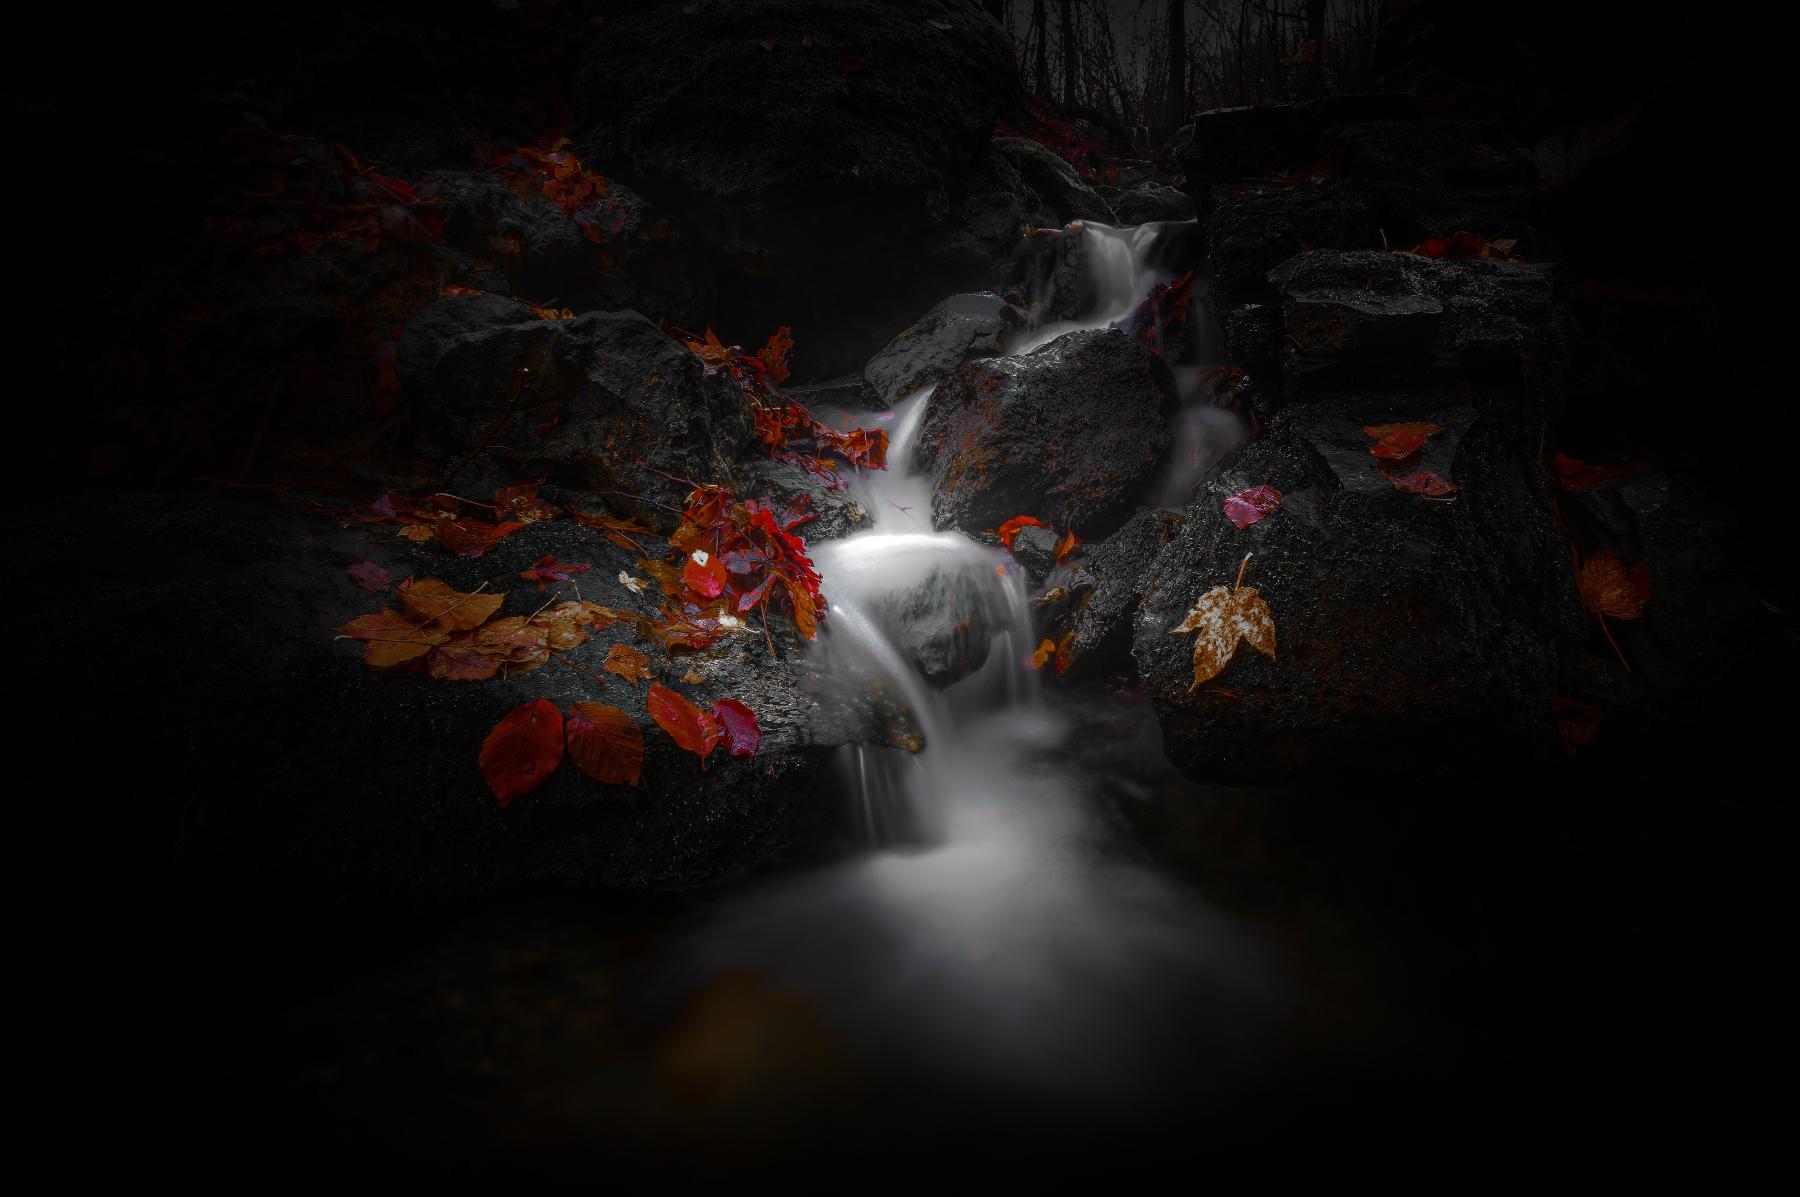 Life flows...